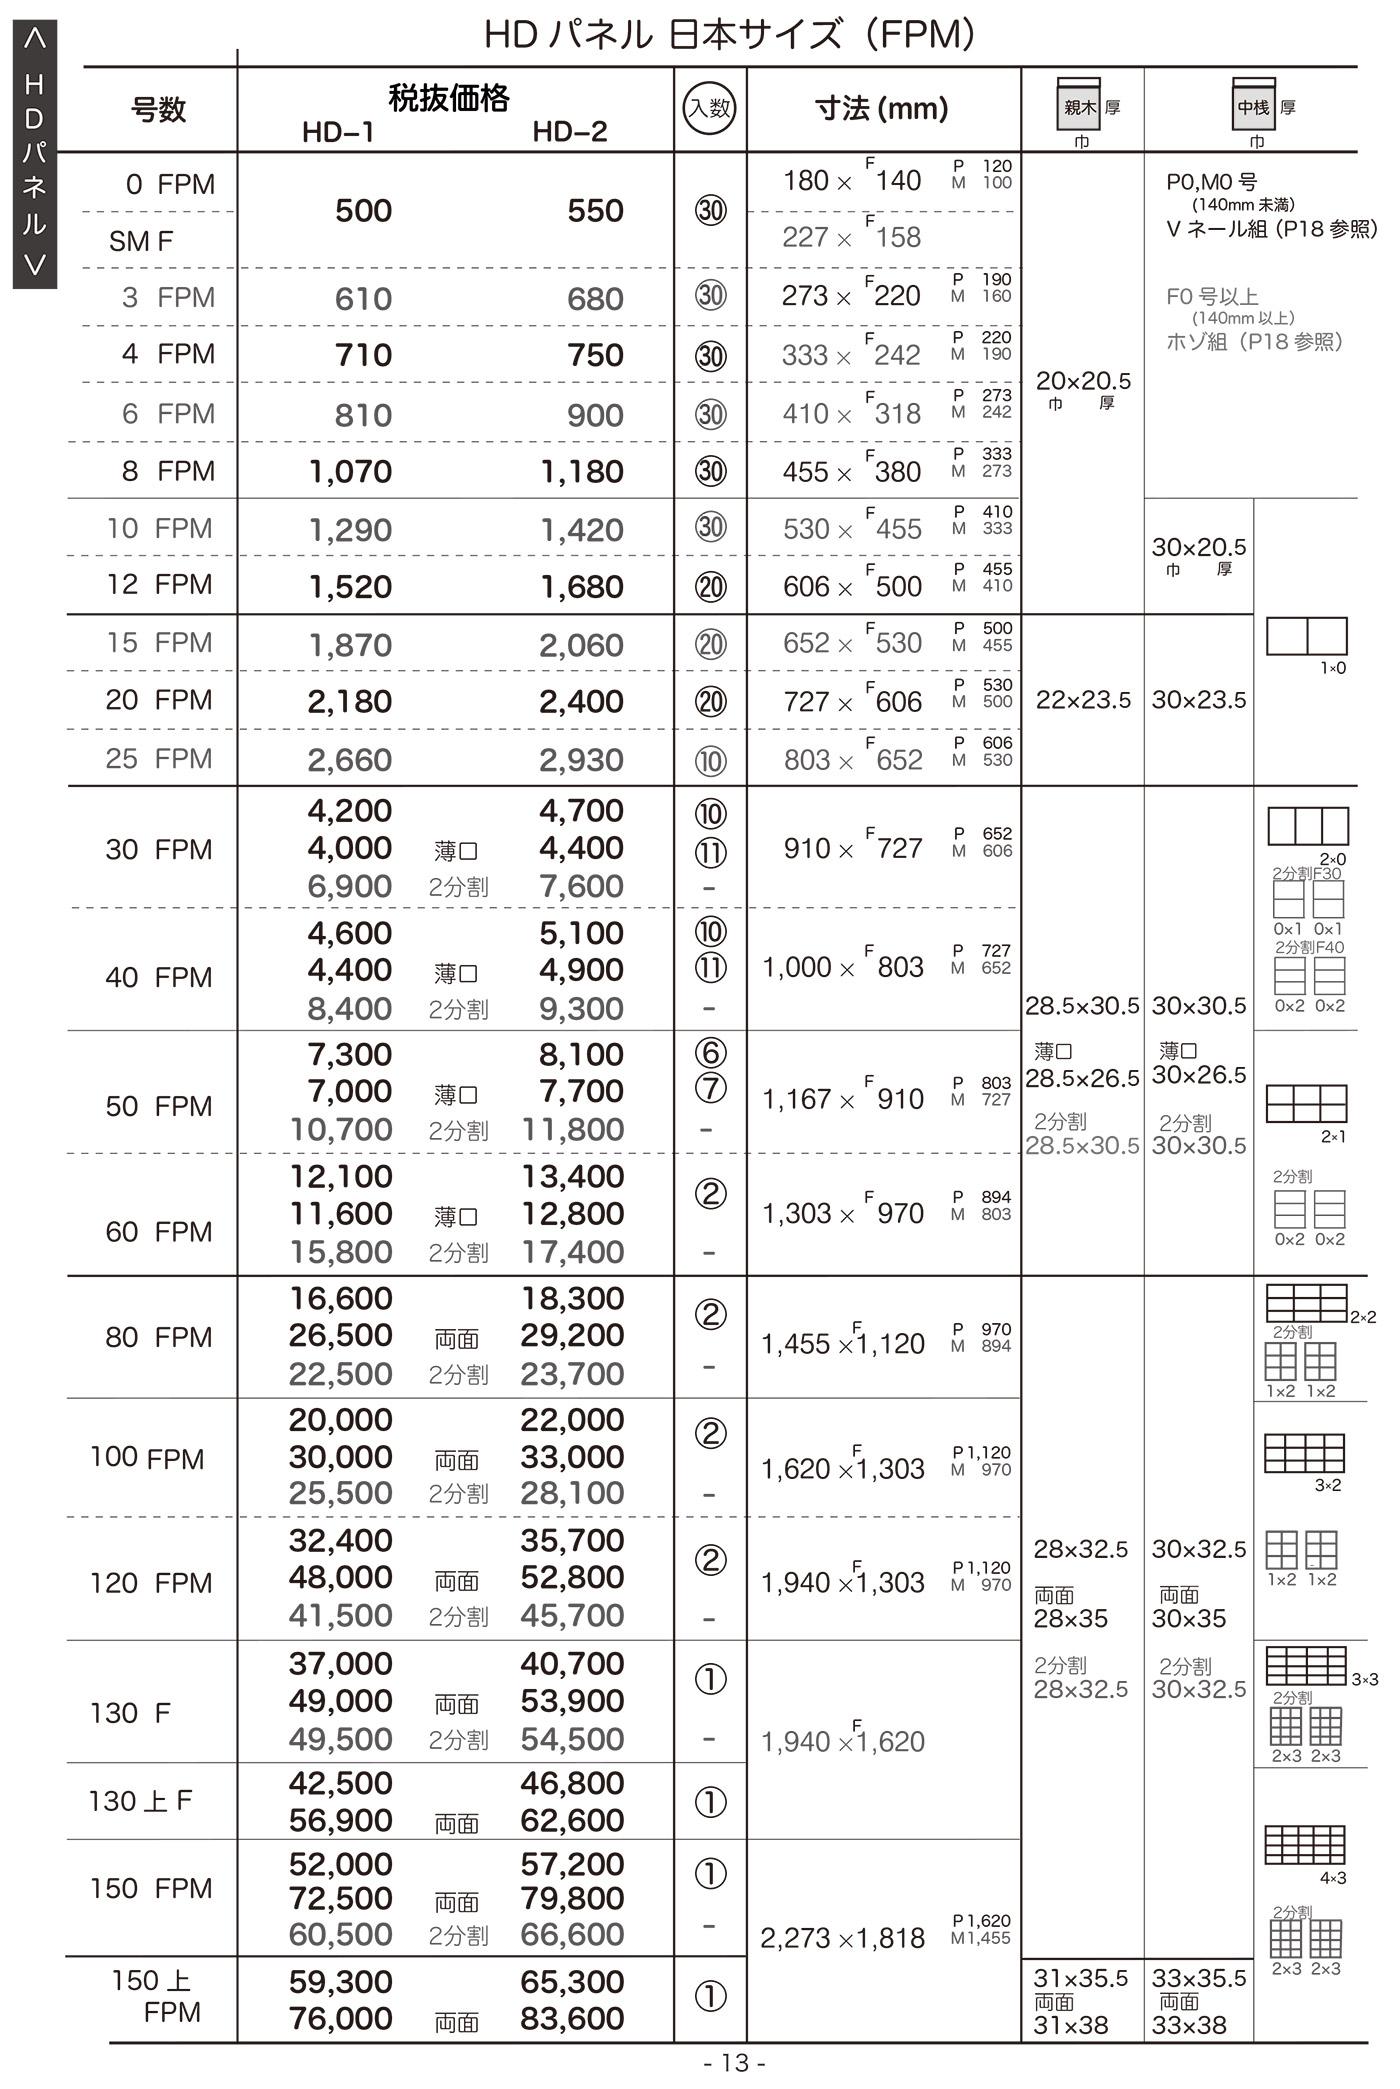 HDパネル日本サイズ